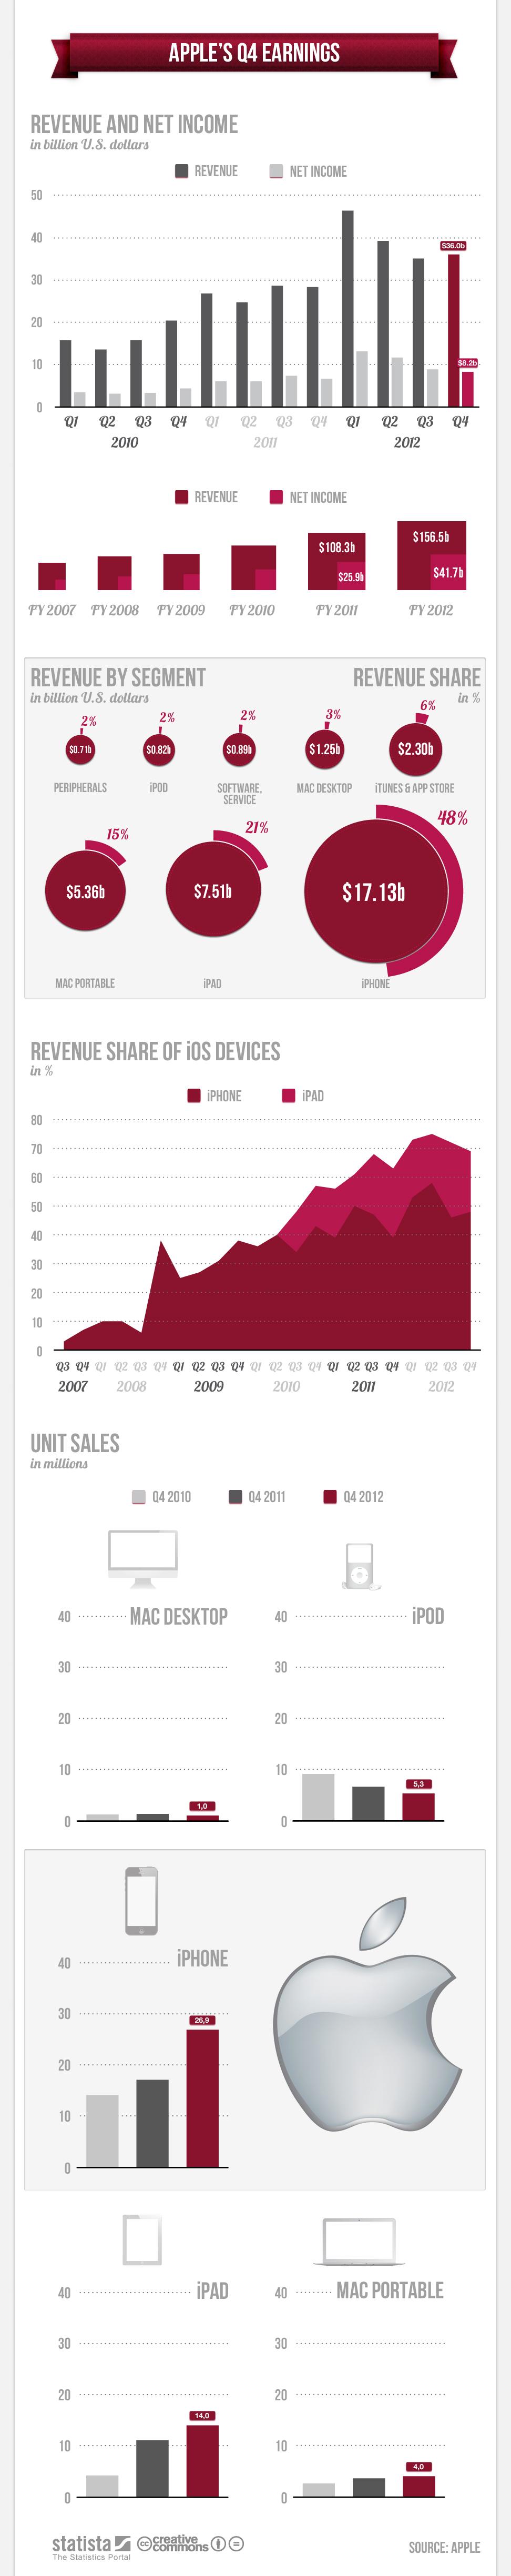 Apple Q4 earning, revenue, profit